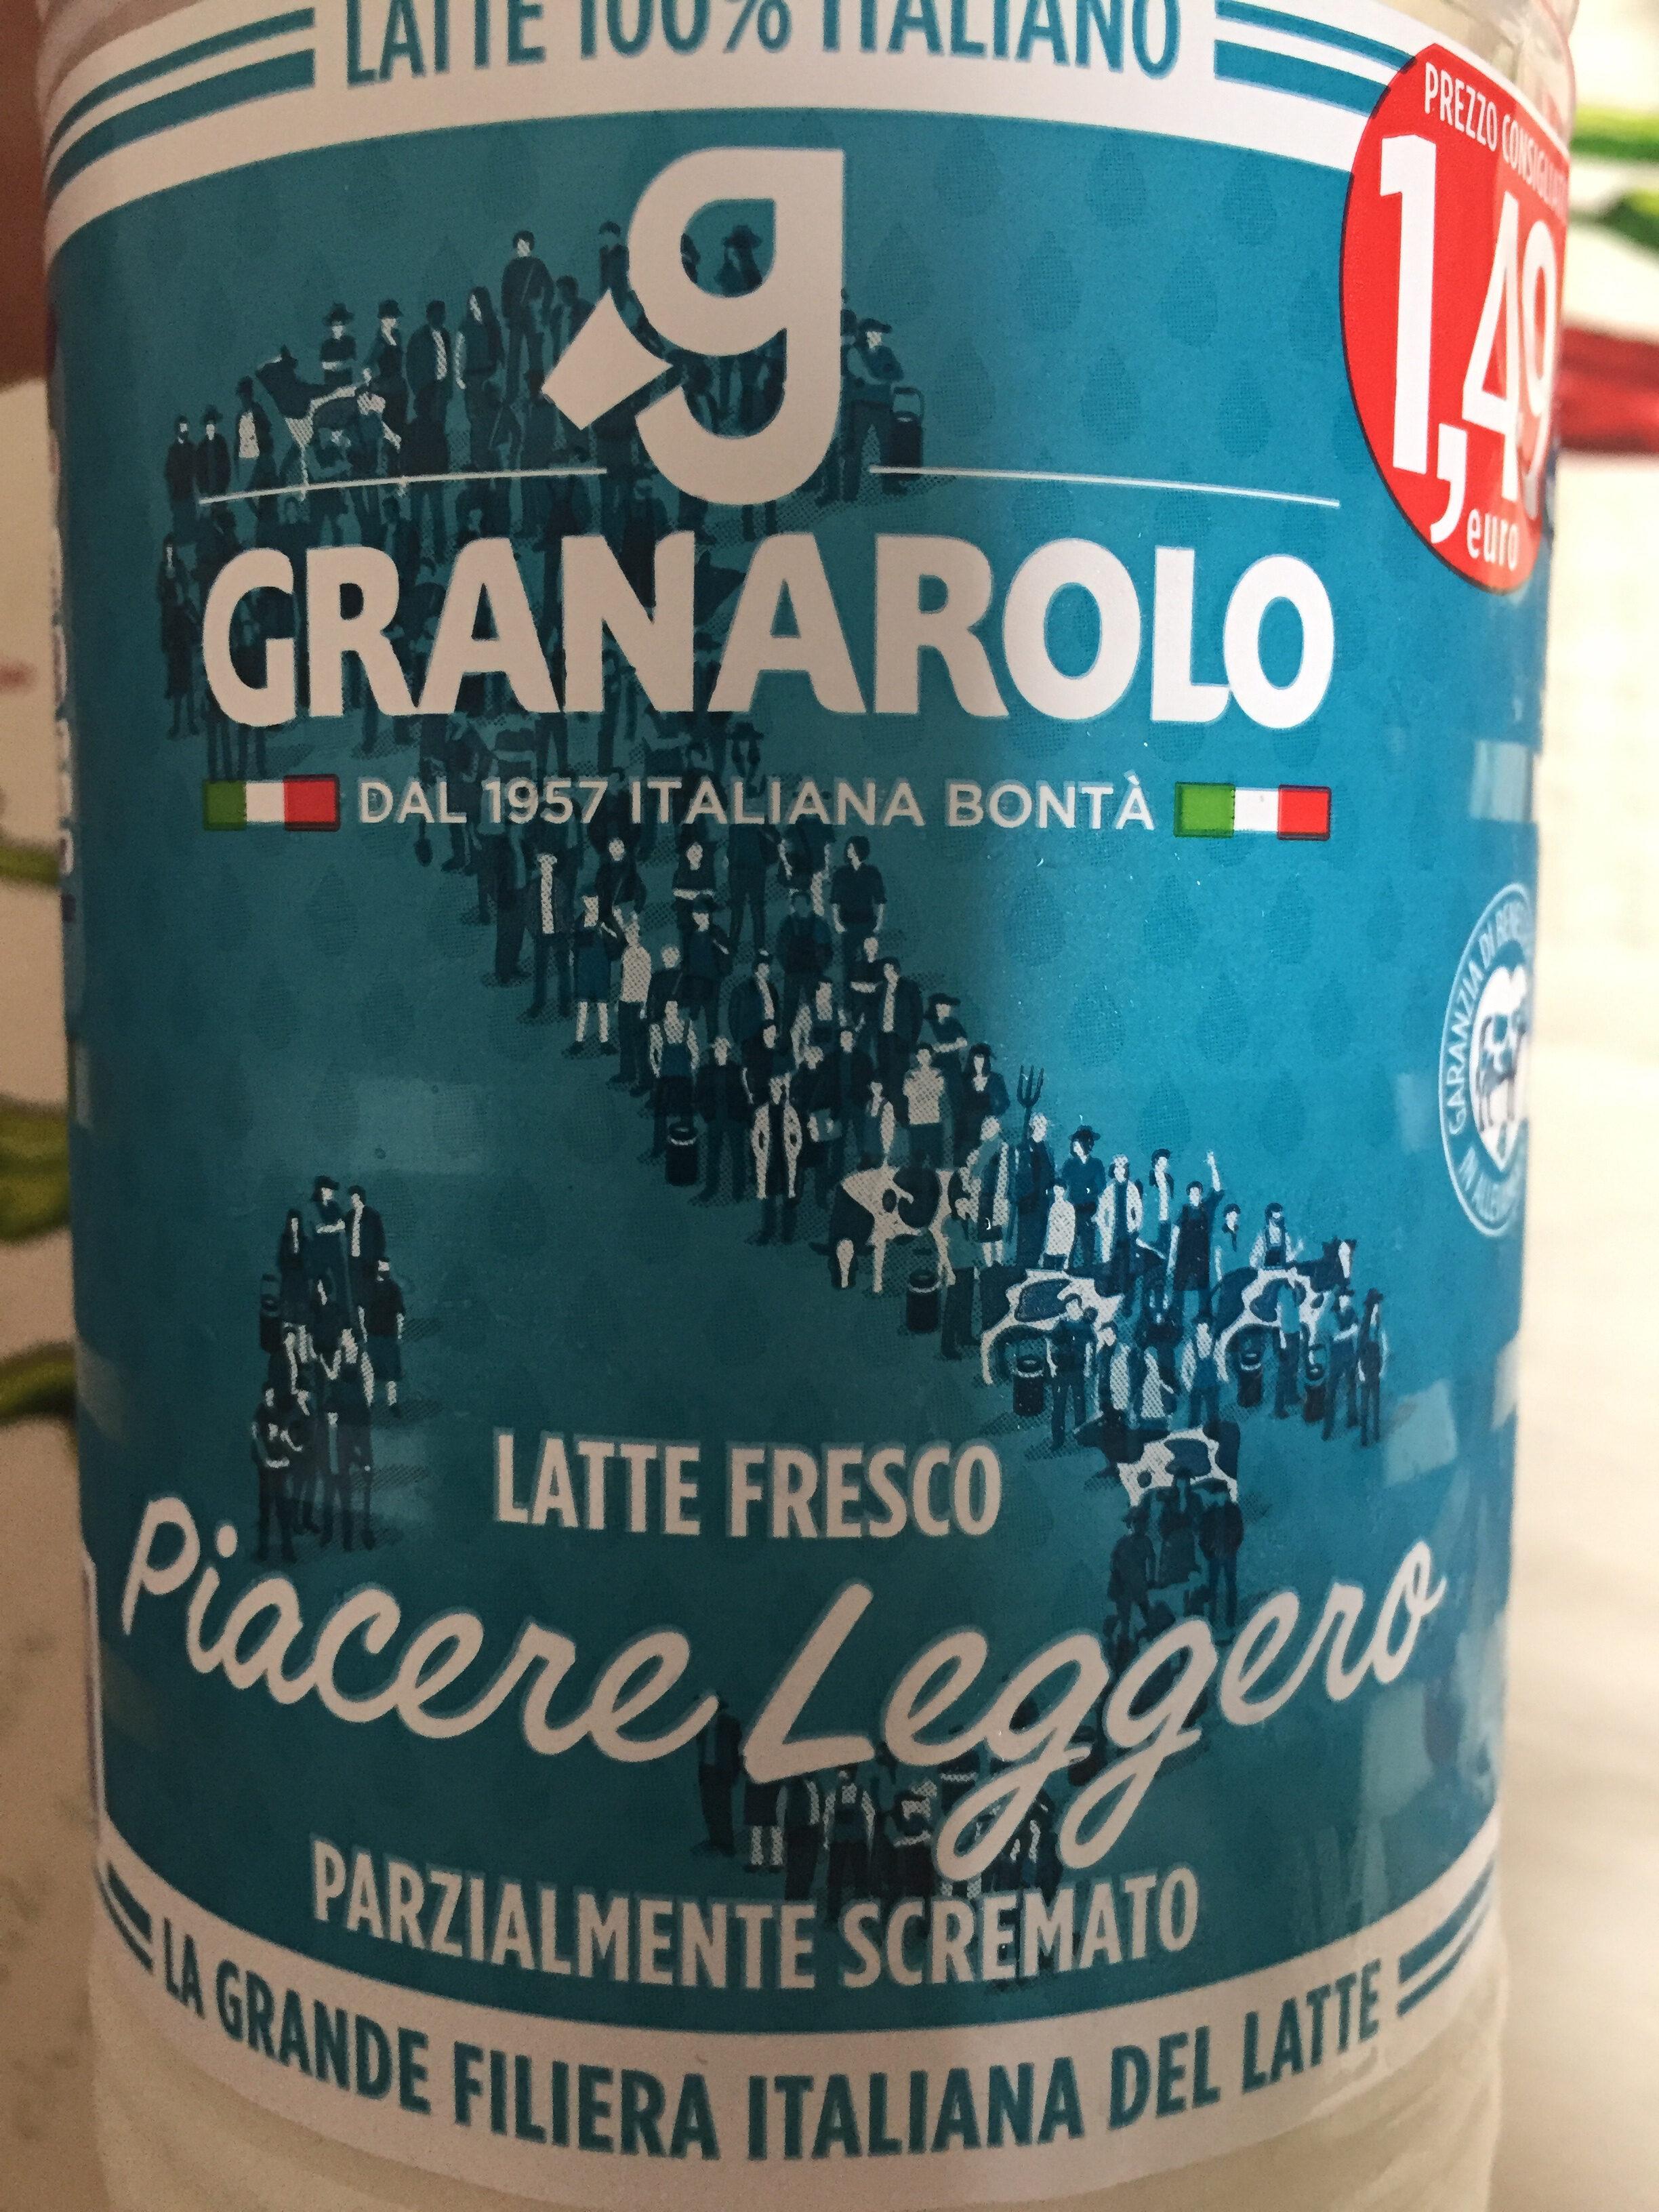 Latte Fresco Piacere Leggero - Product - it